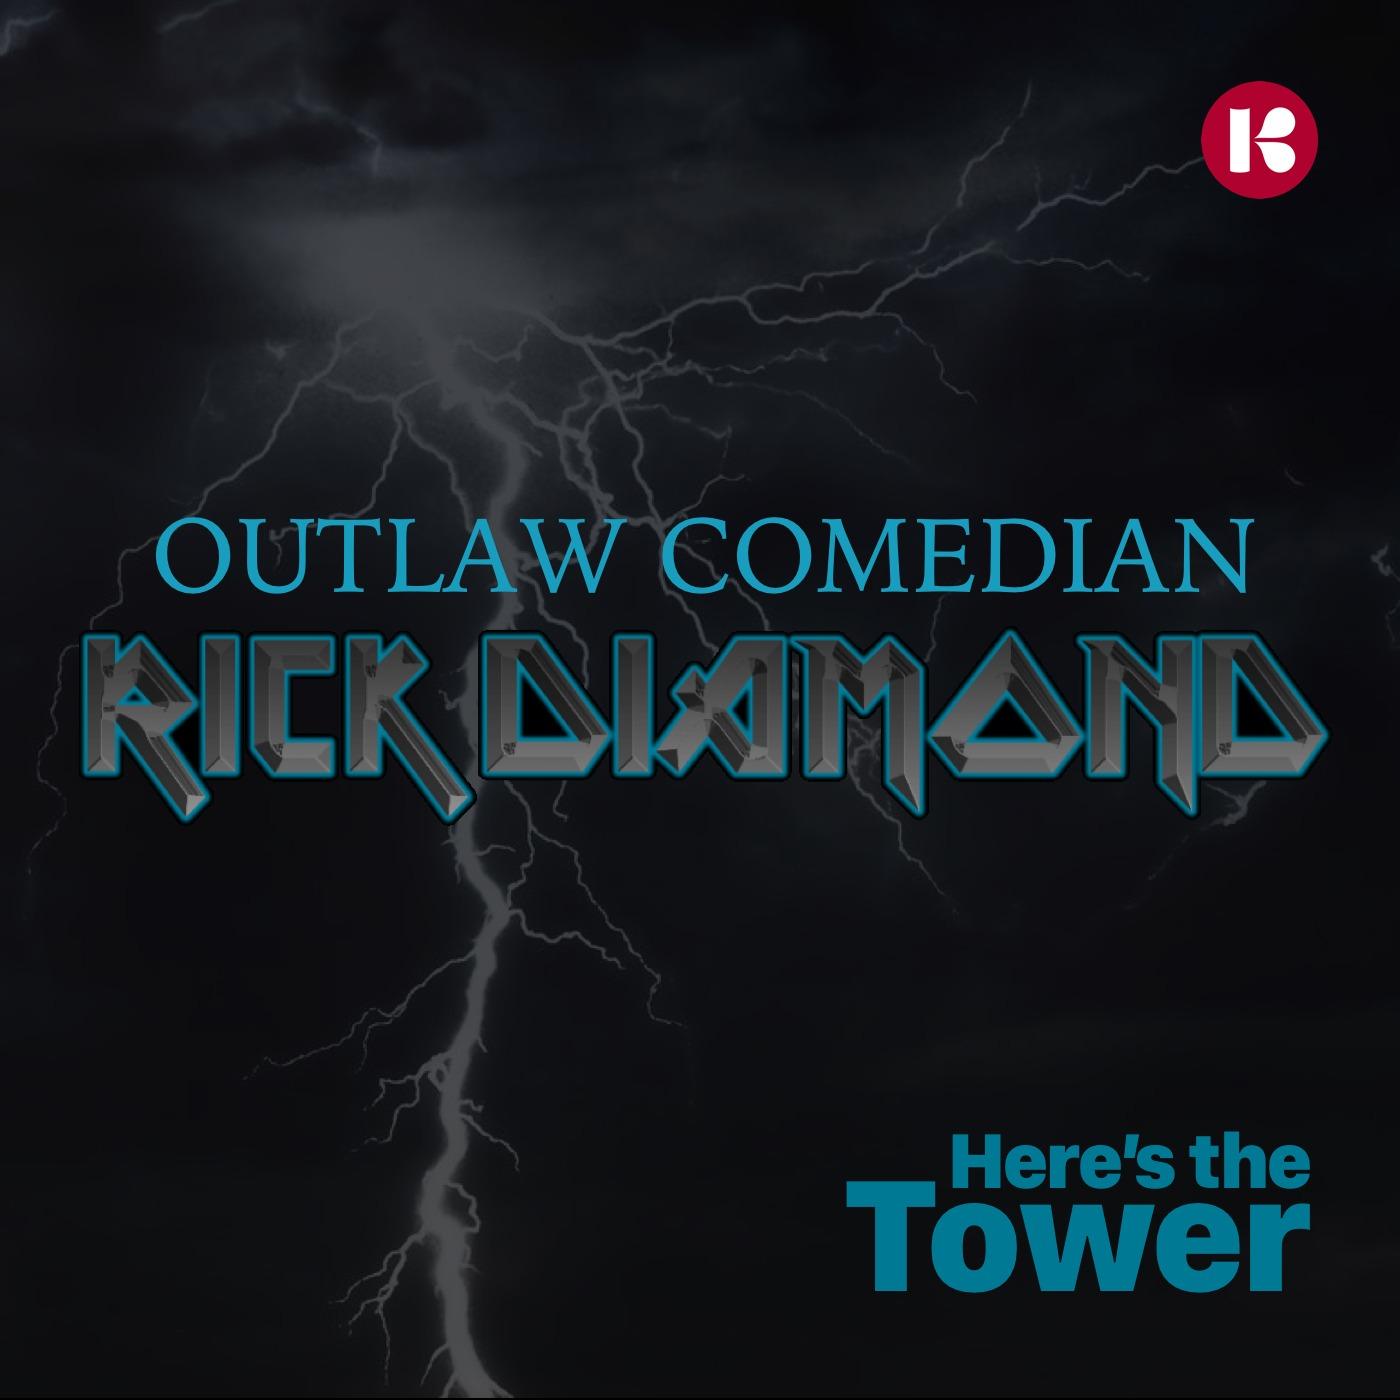 Outlaw Comedian Rick Diamond